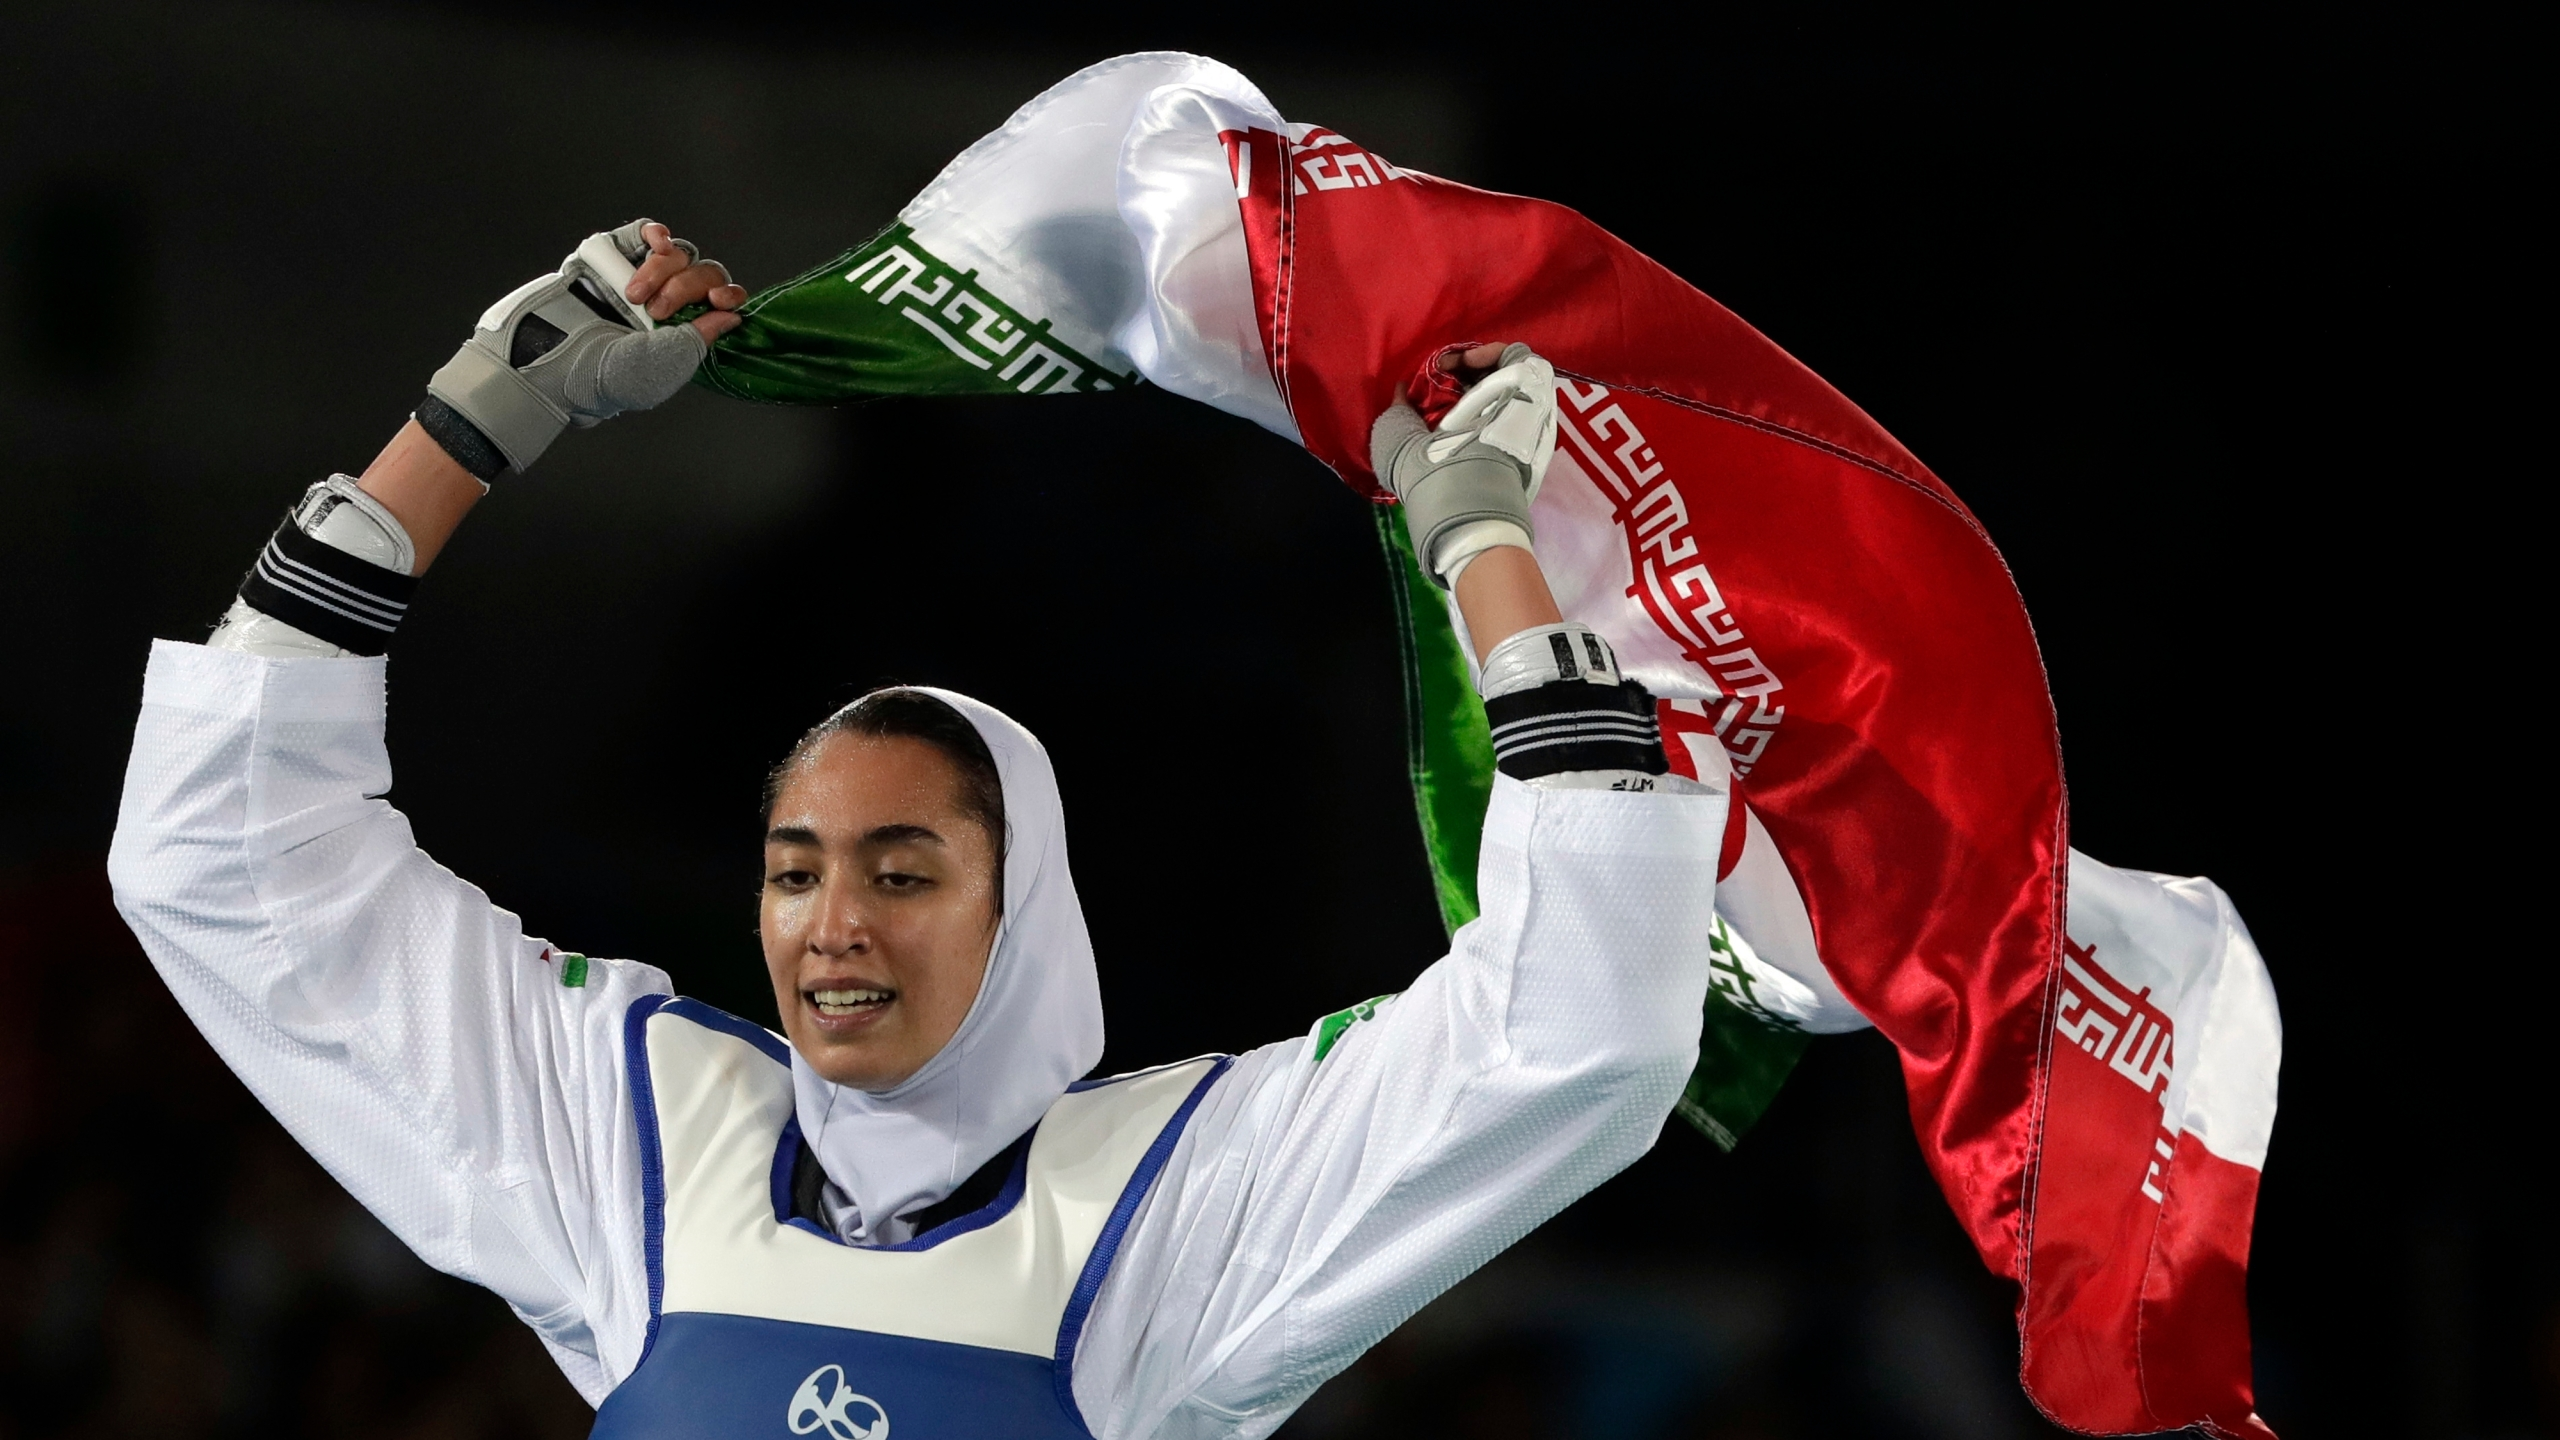 Kimia Alizadeh Zenoorin